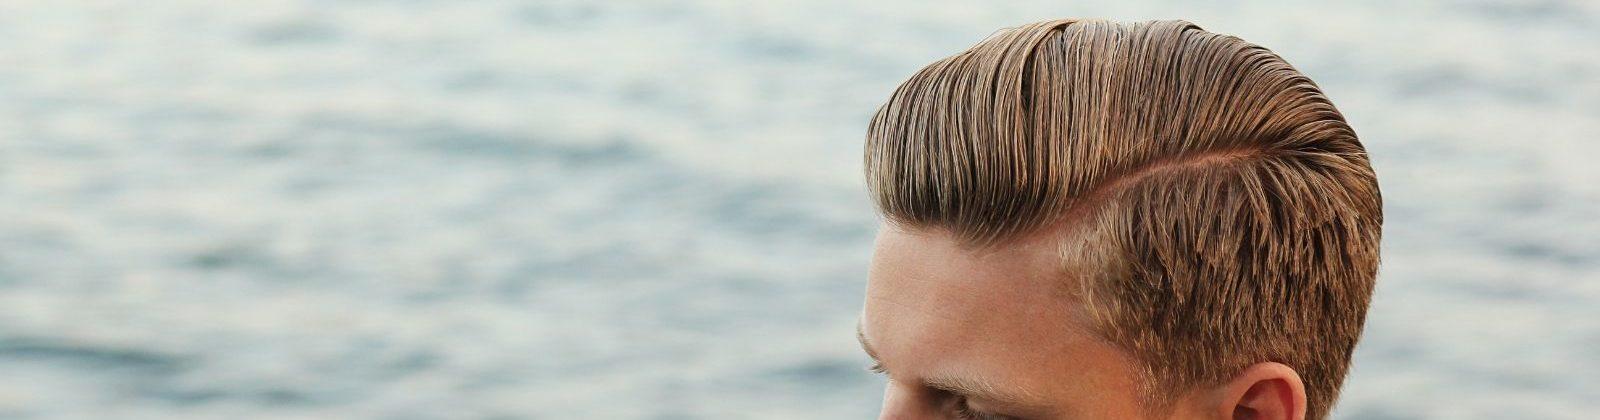 hair transplant myths